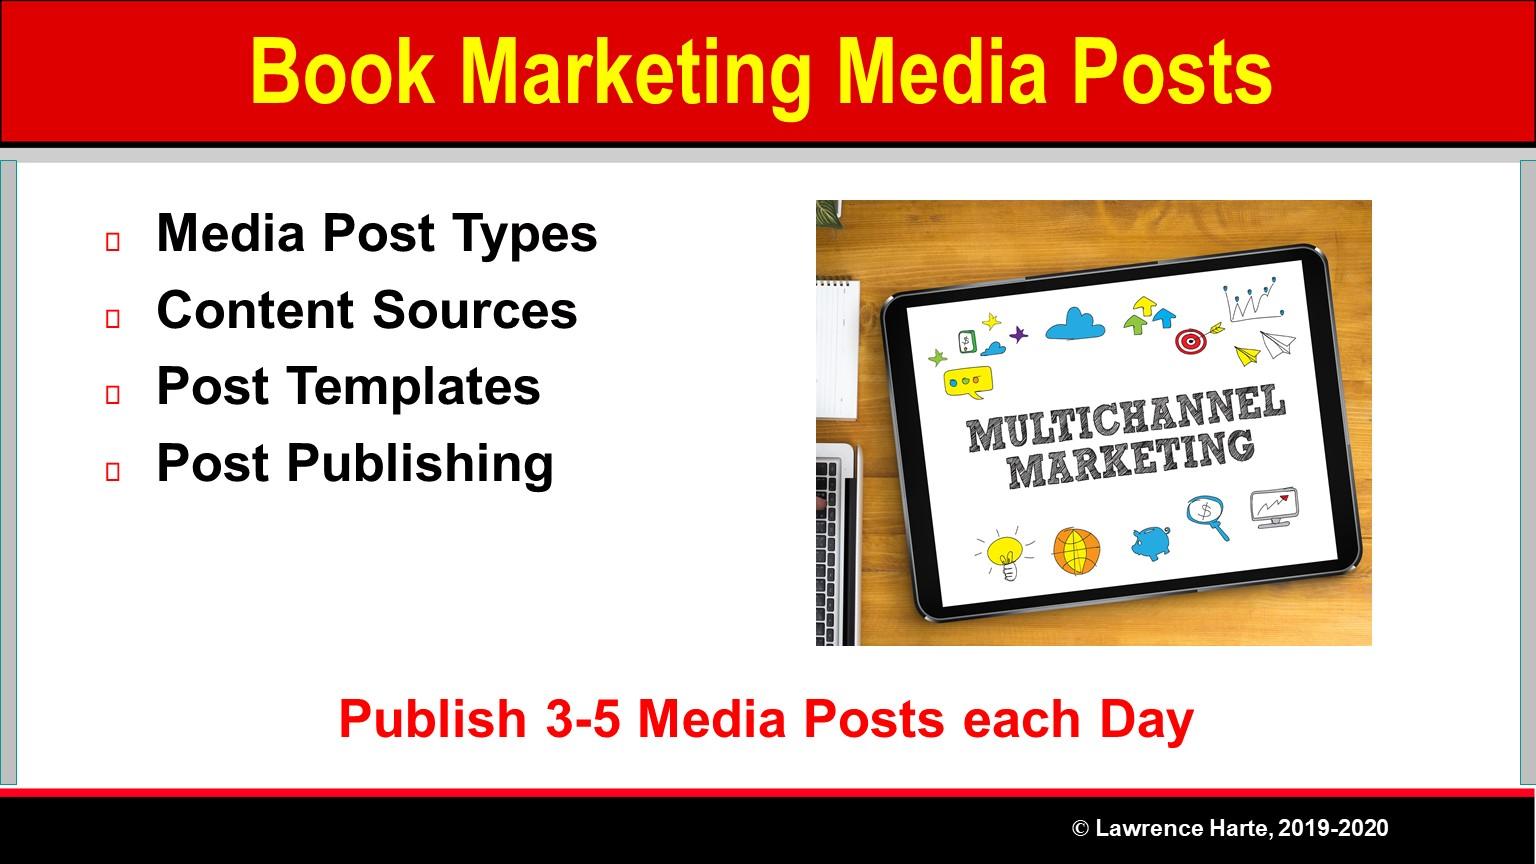 Book Pre-Launch Marketing Media Posts